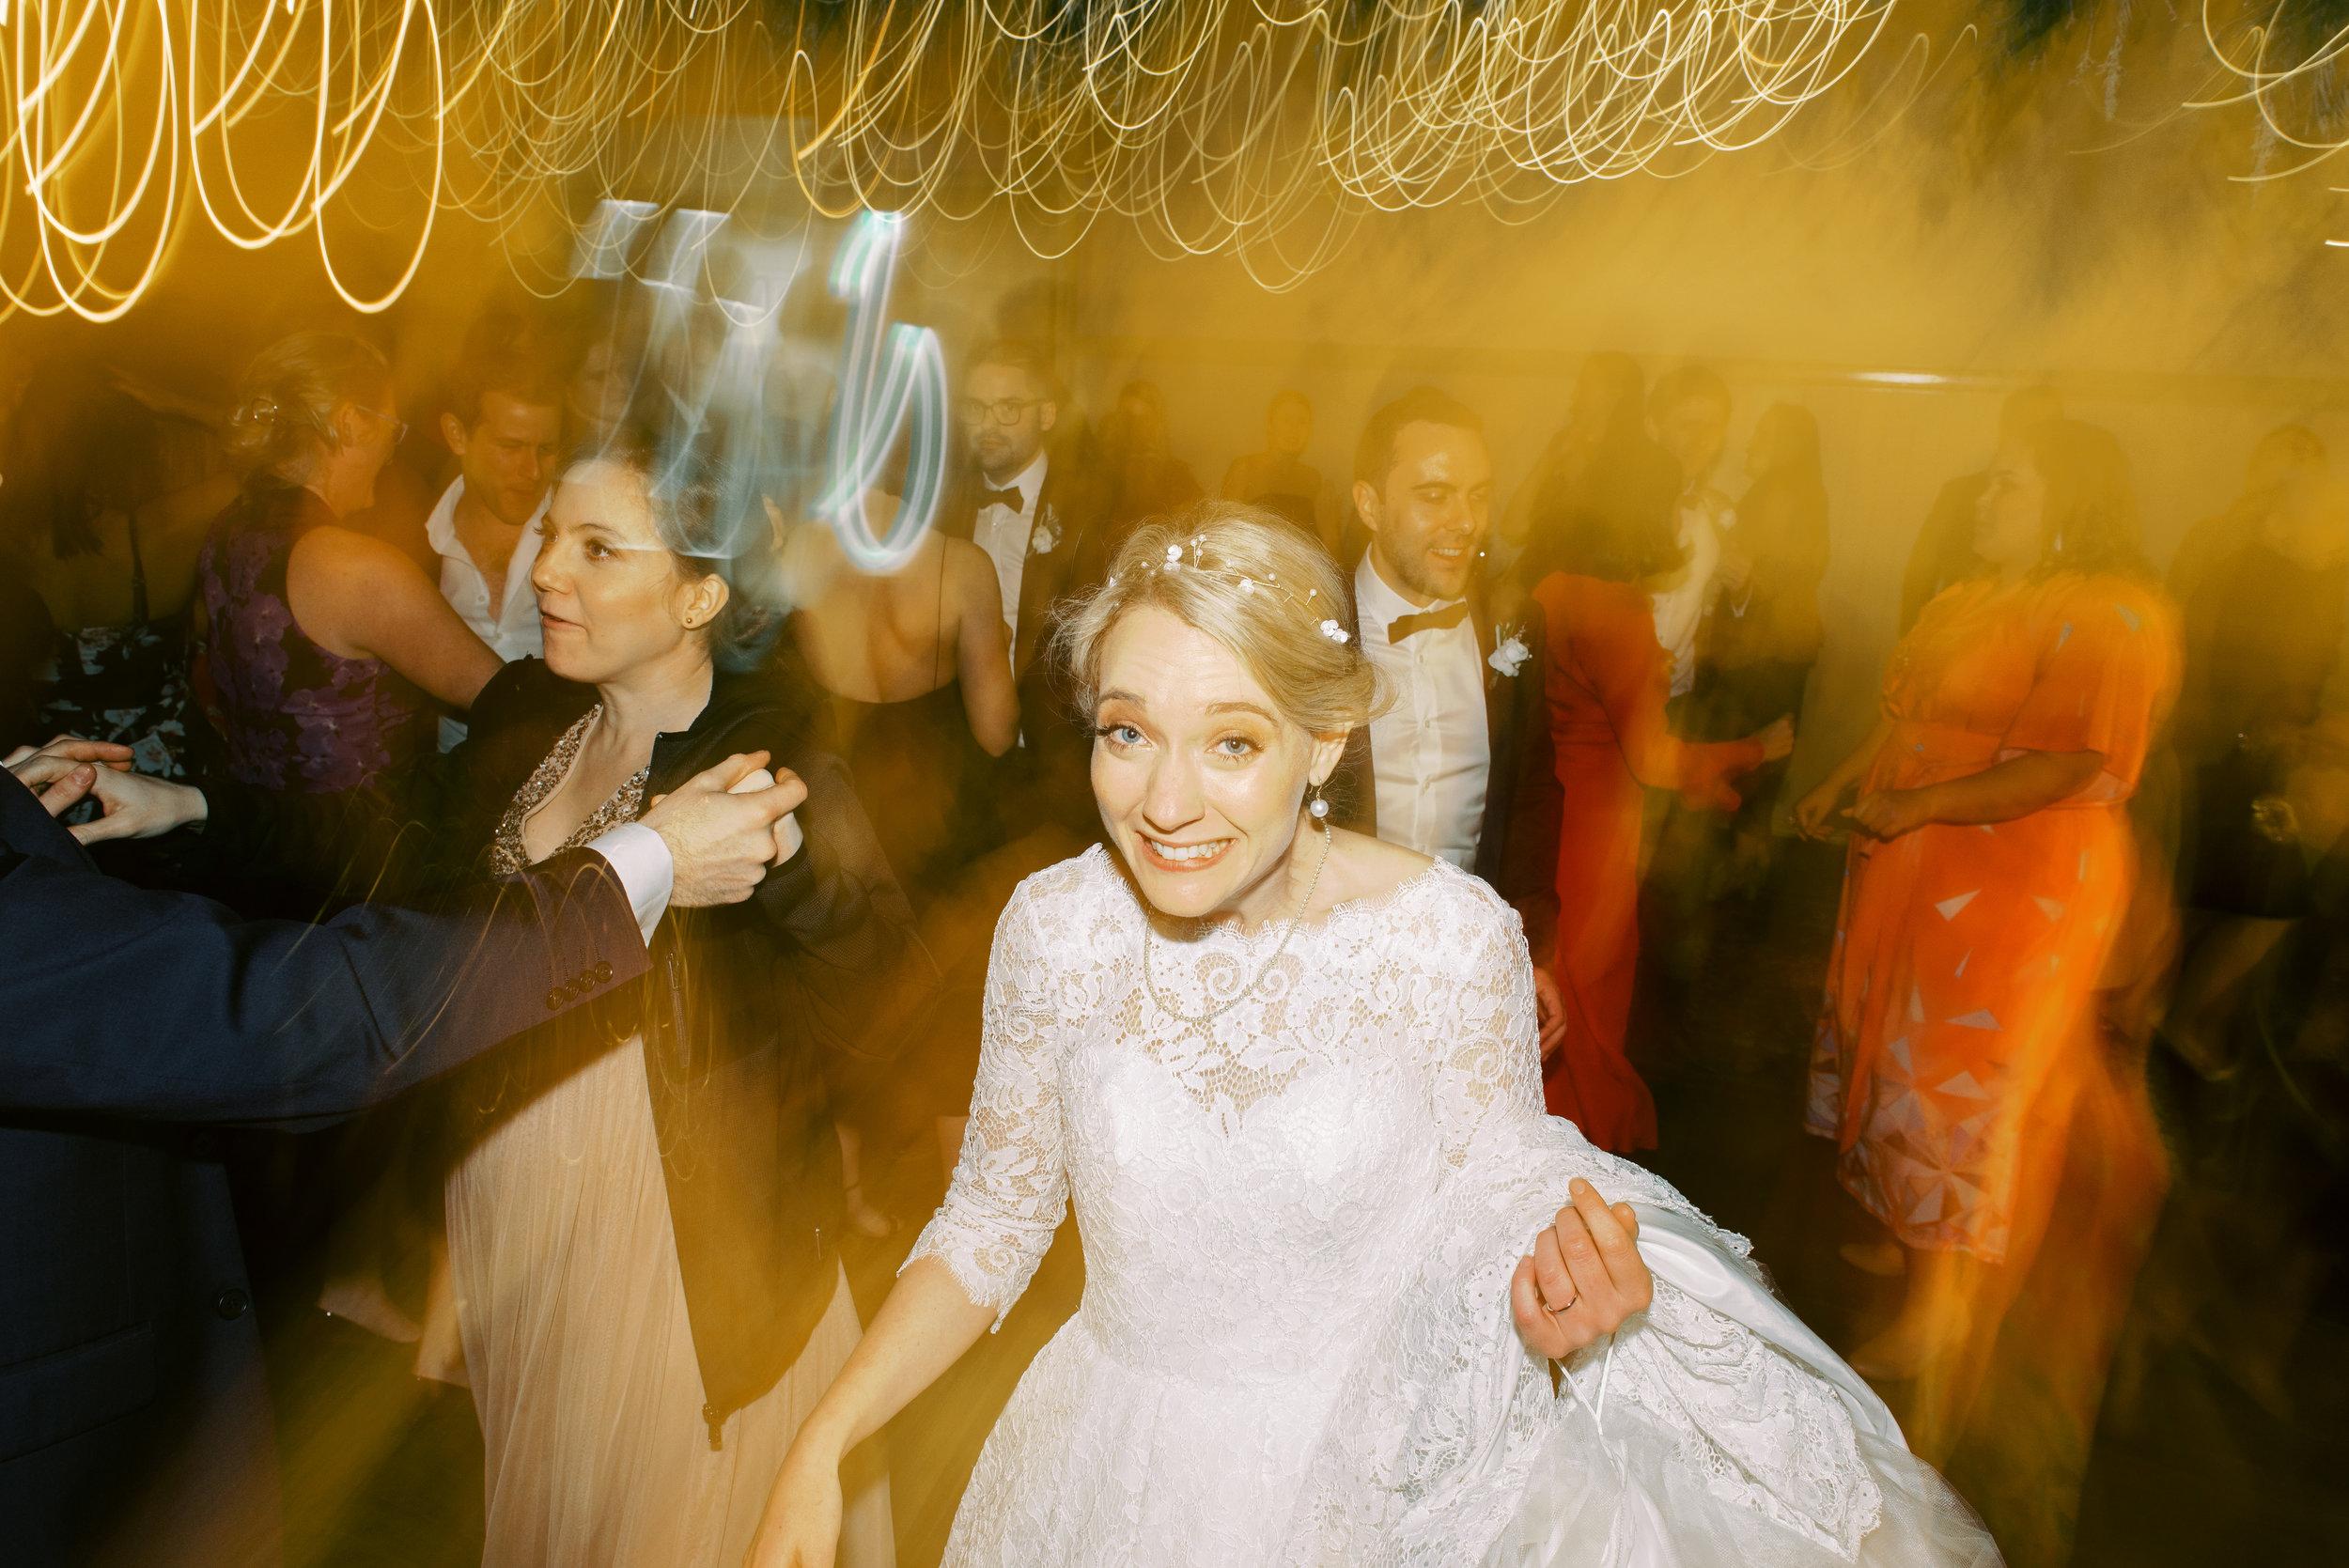 brisbane-gold-coast-sunshine-coast-tweed-romantic-fine-art-wedding-photography-lauren-olivia-86.jpg